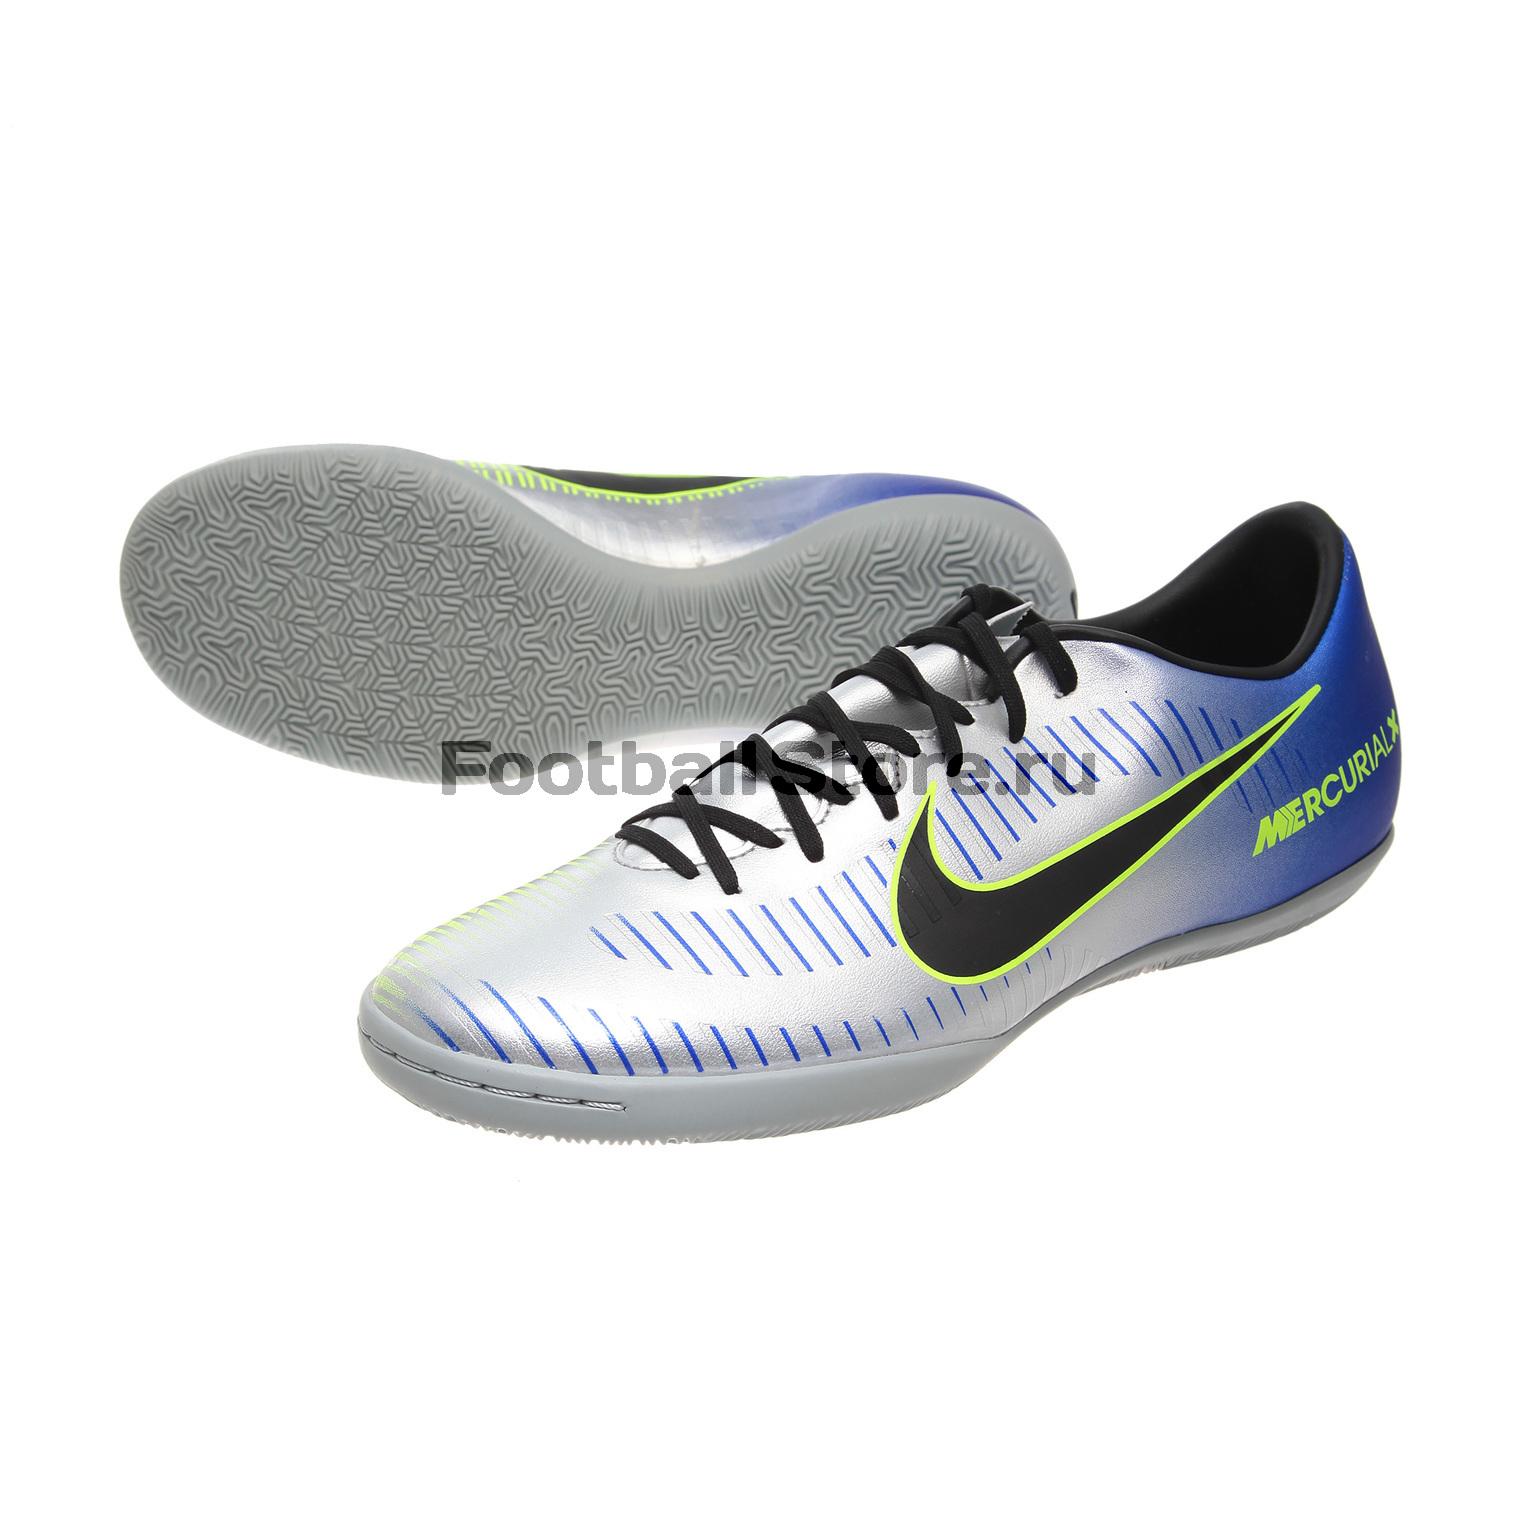 58f411f3 Обувь зала Nike Mercurial X Victory VI Neymar IC 921516-407 – купить ...